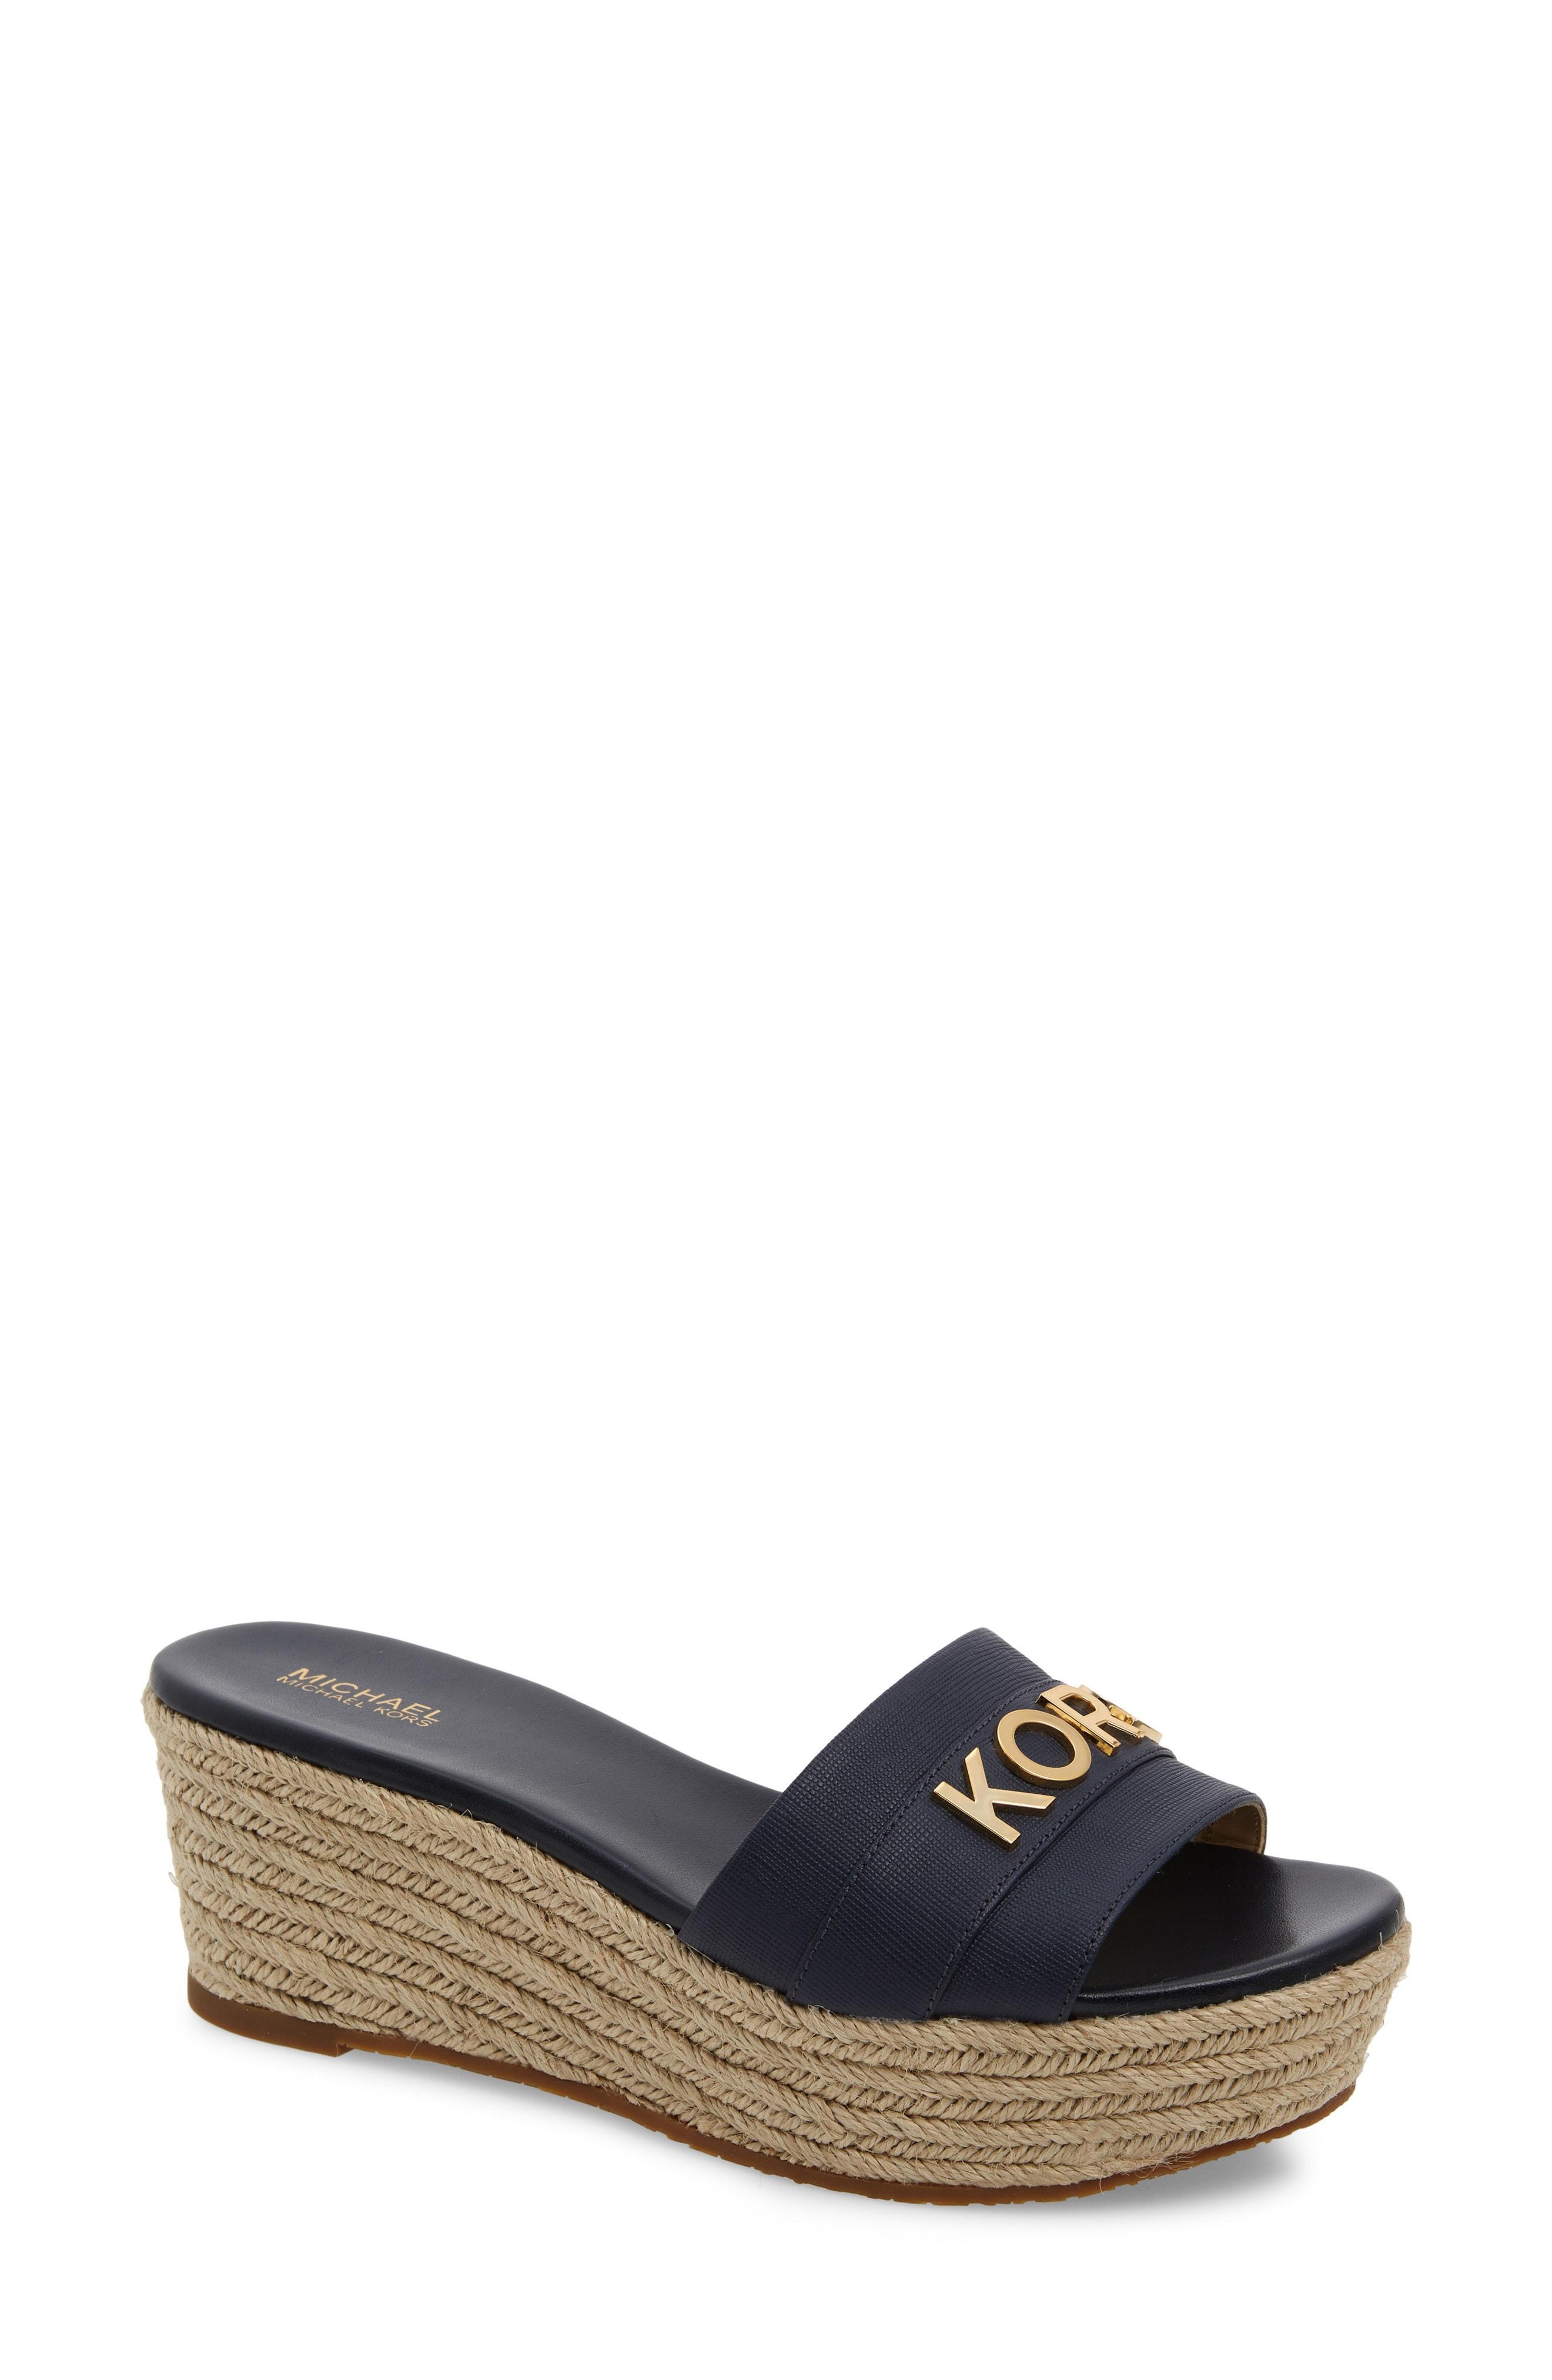 32b0ab916c56 MICHAEL Michael Kors. Women s Brady Platform Slide Sandal